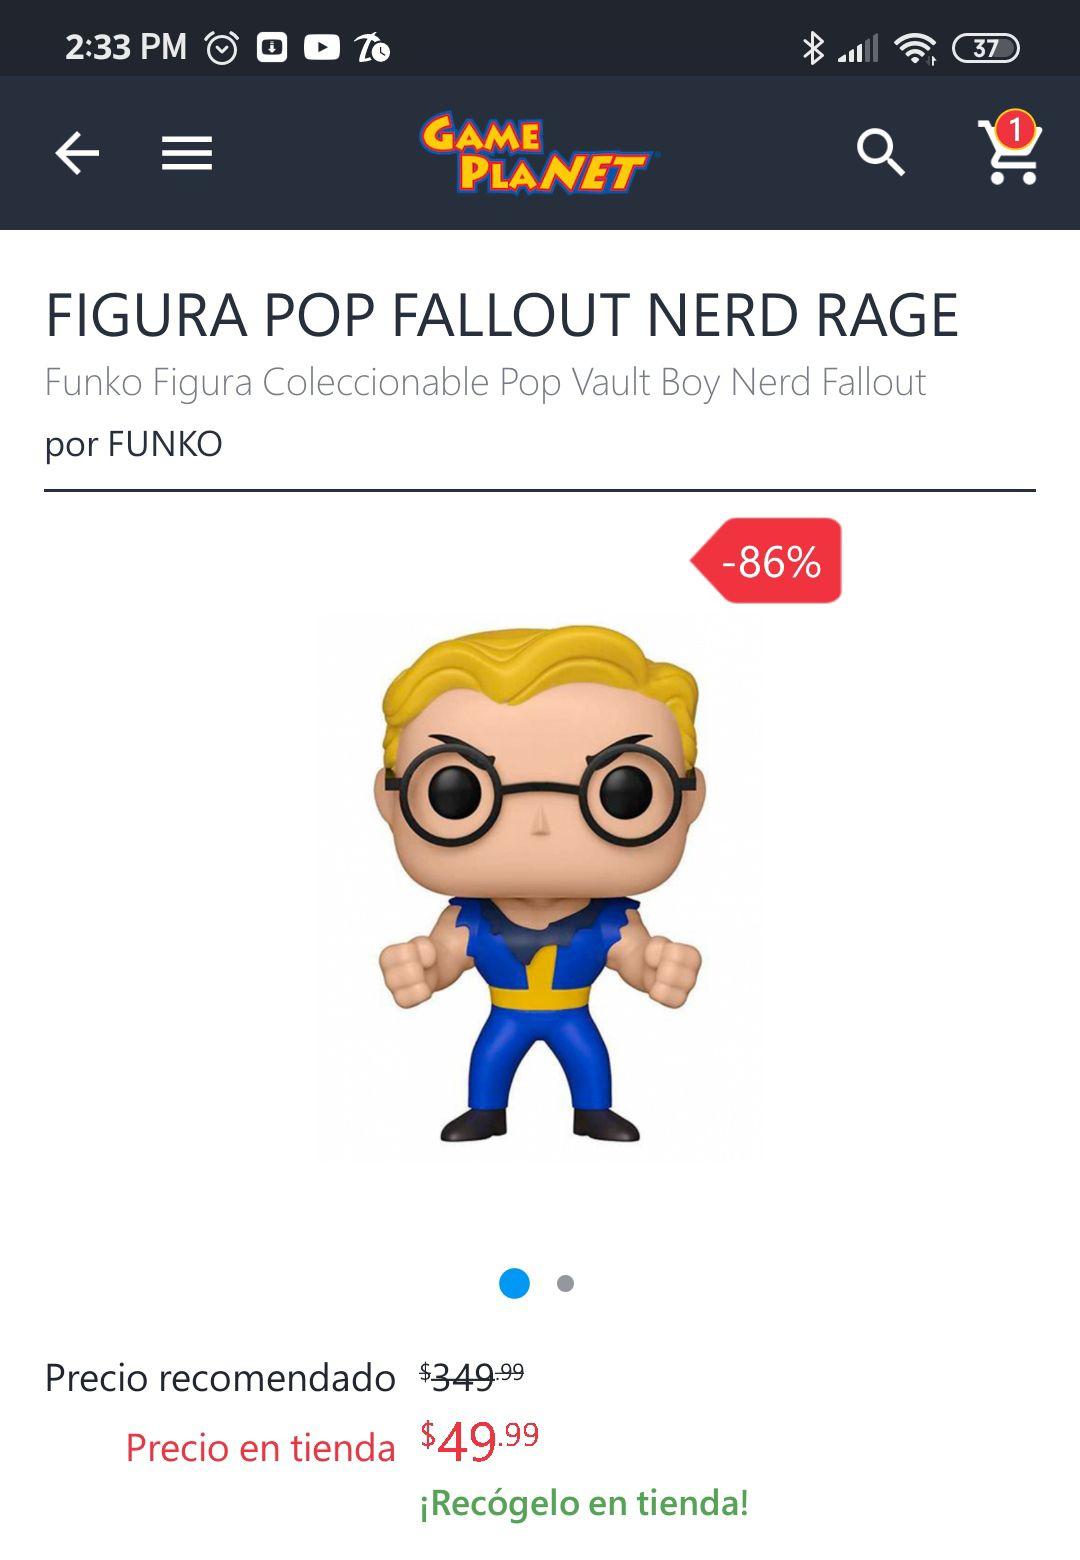 Game Planet: Funko Pop Fallout Nerd Rage